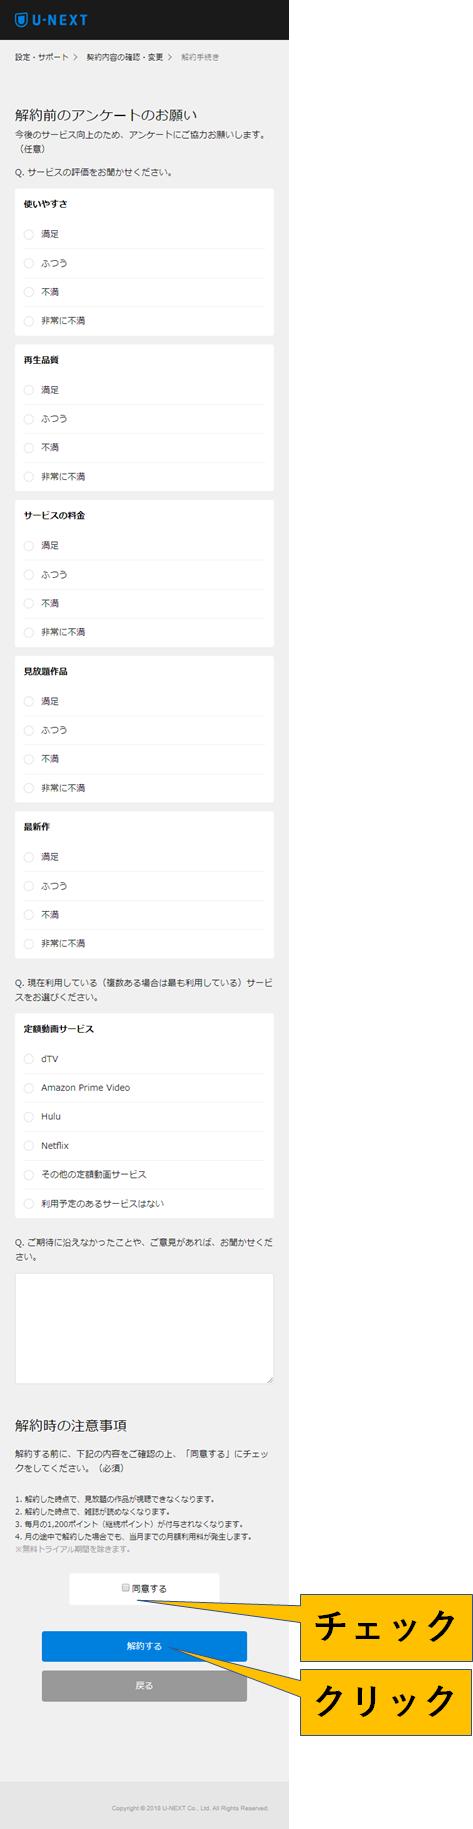 u-next 解約➄